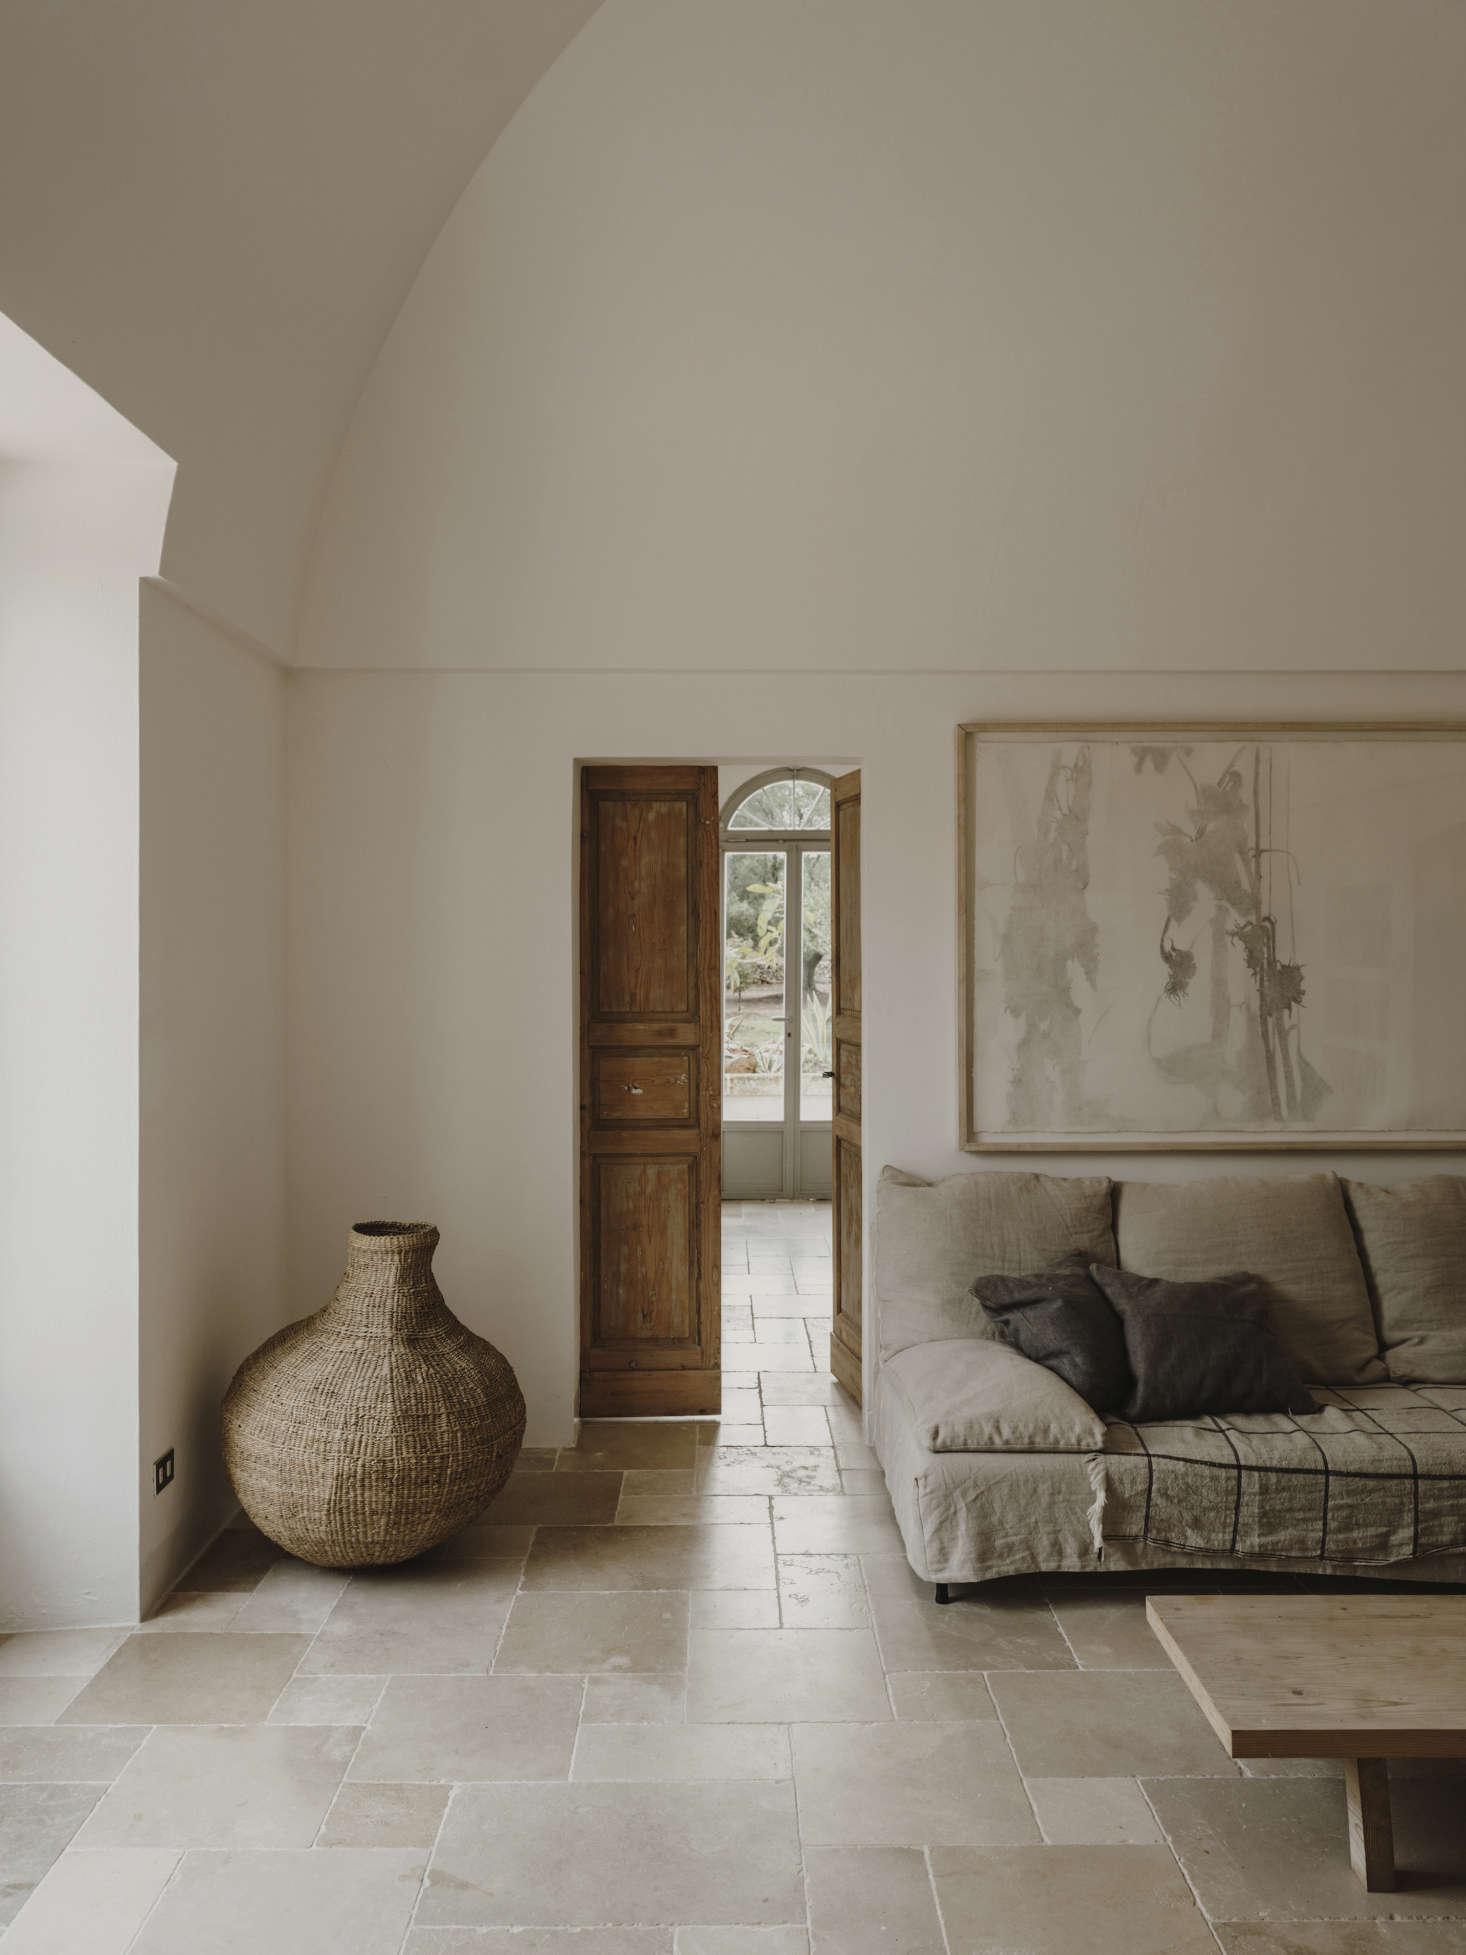 Inside, whitewashed walls meet stone floors and laid-back, linen-covered sofas reminiscent of Trotter's Masseria Moroseta.